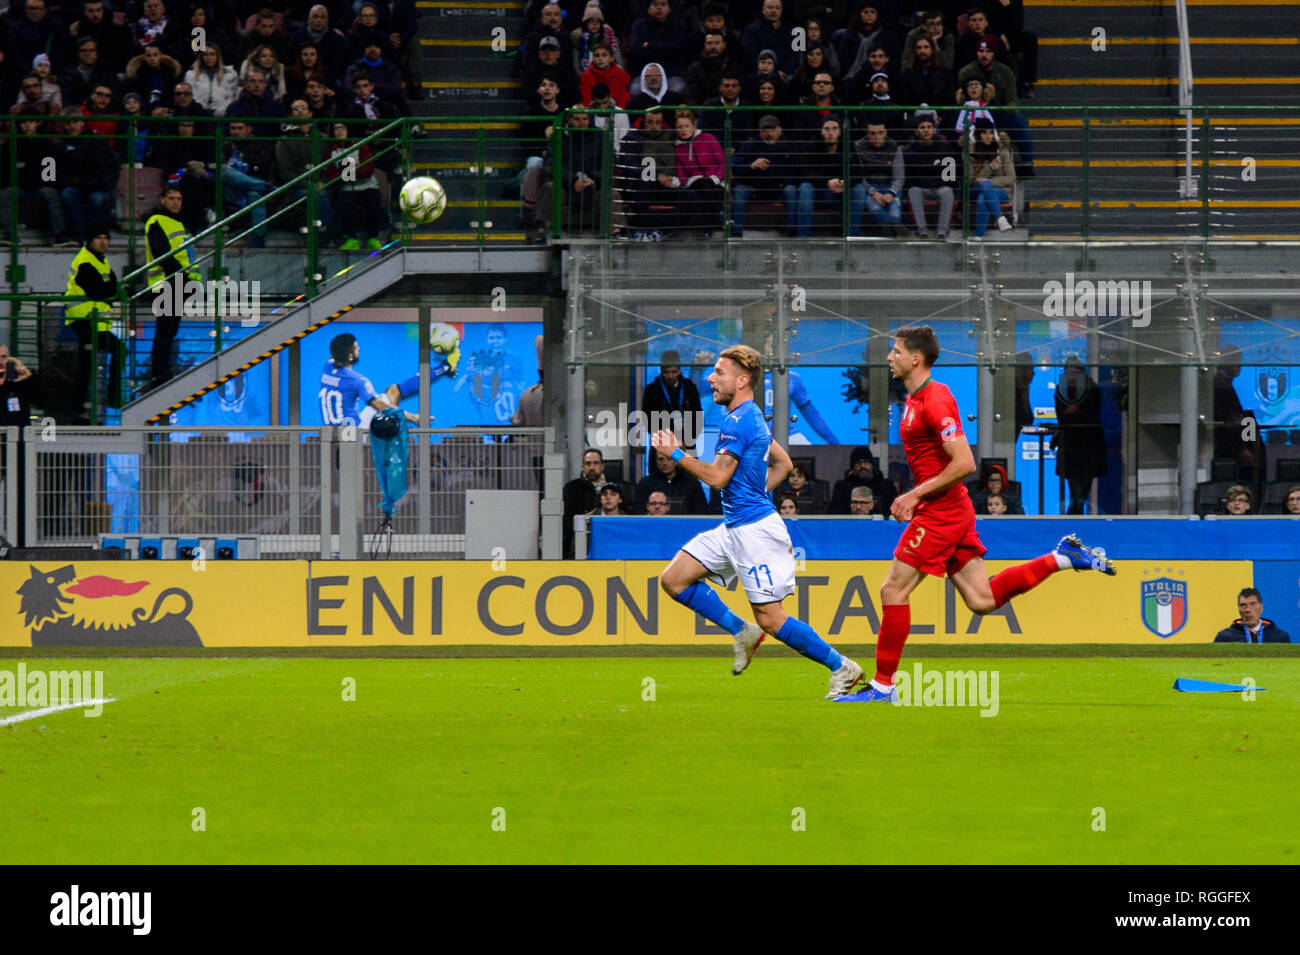 MILAN - NOV 17, 2018:  Ciro Immobile 17. Italy - Portugal. UEFA Nations League. Giuseppe Meazza stadium. Stock Photo